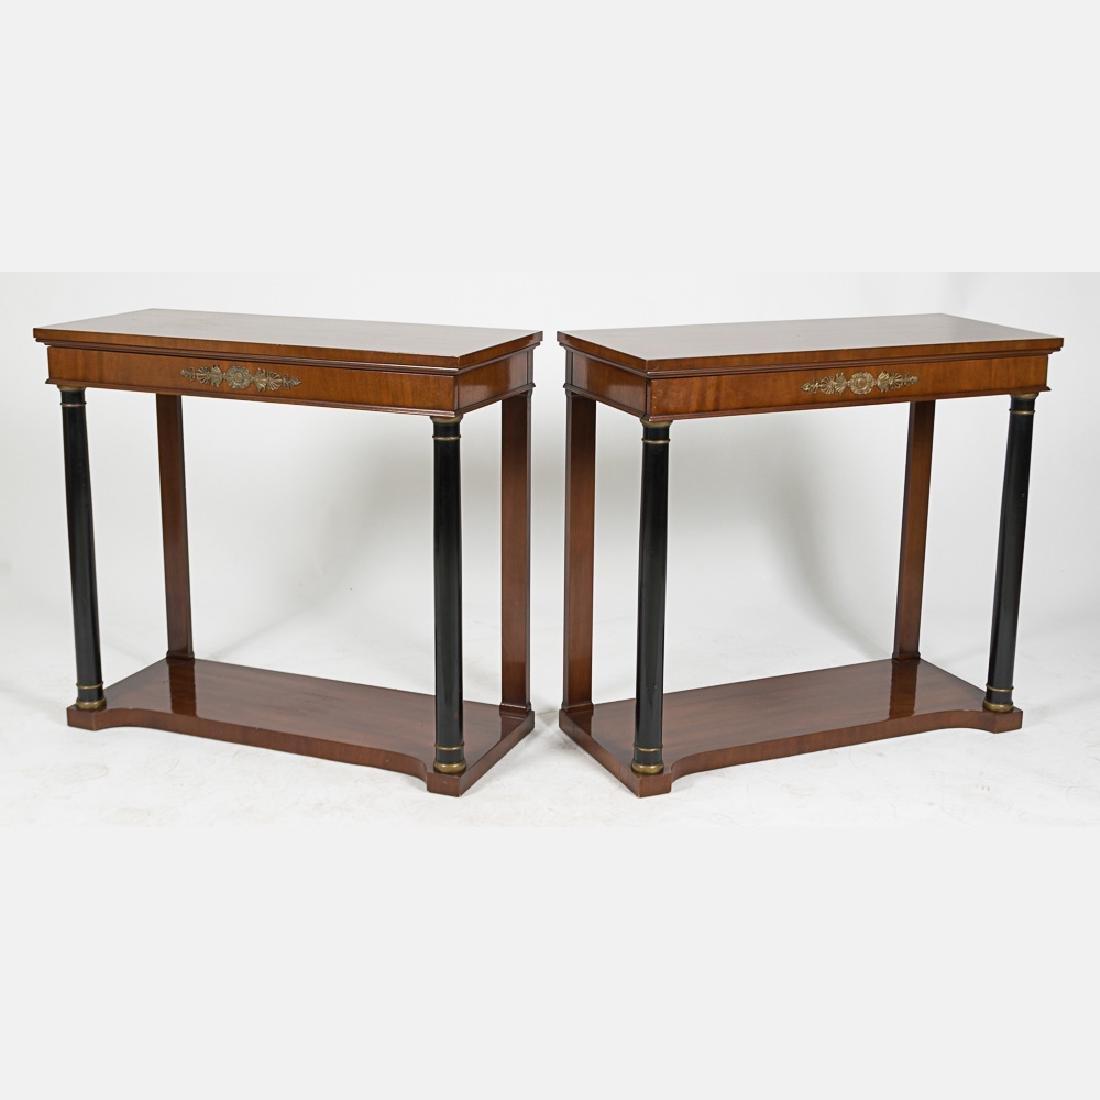 A Pair of Kittinger Mahogany and Ebonized Wood Console